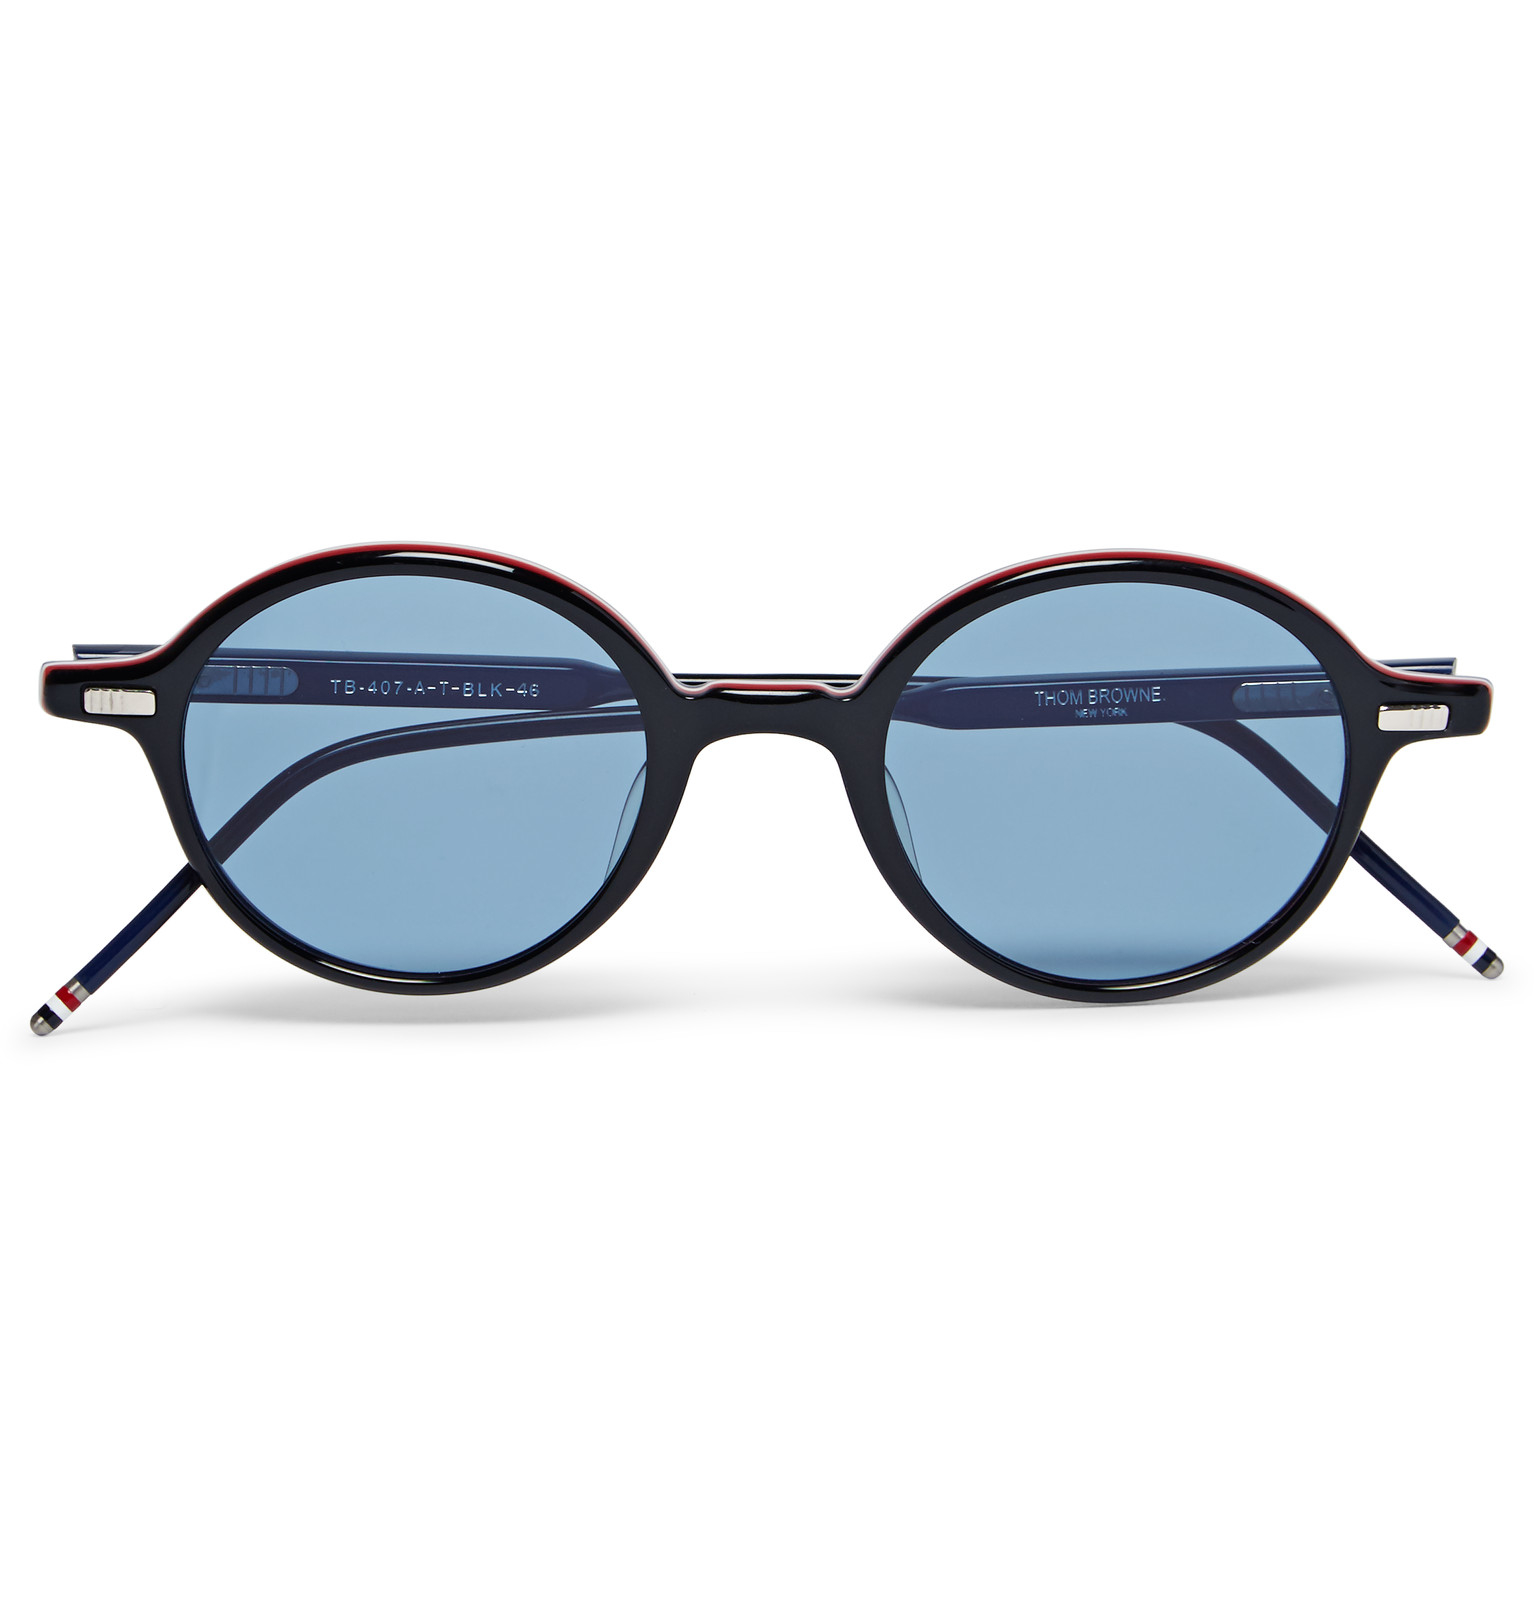 a780f9568cf Thom Browne Round-frame Striped Acetate Sunglasses in Black for Men ...